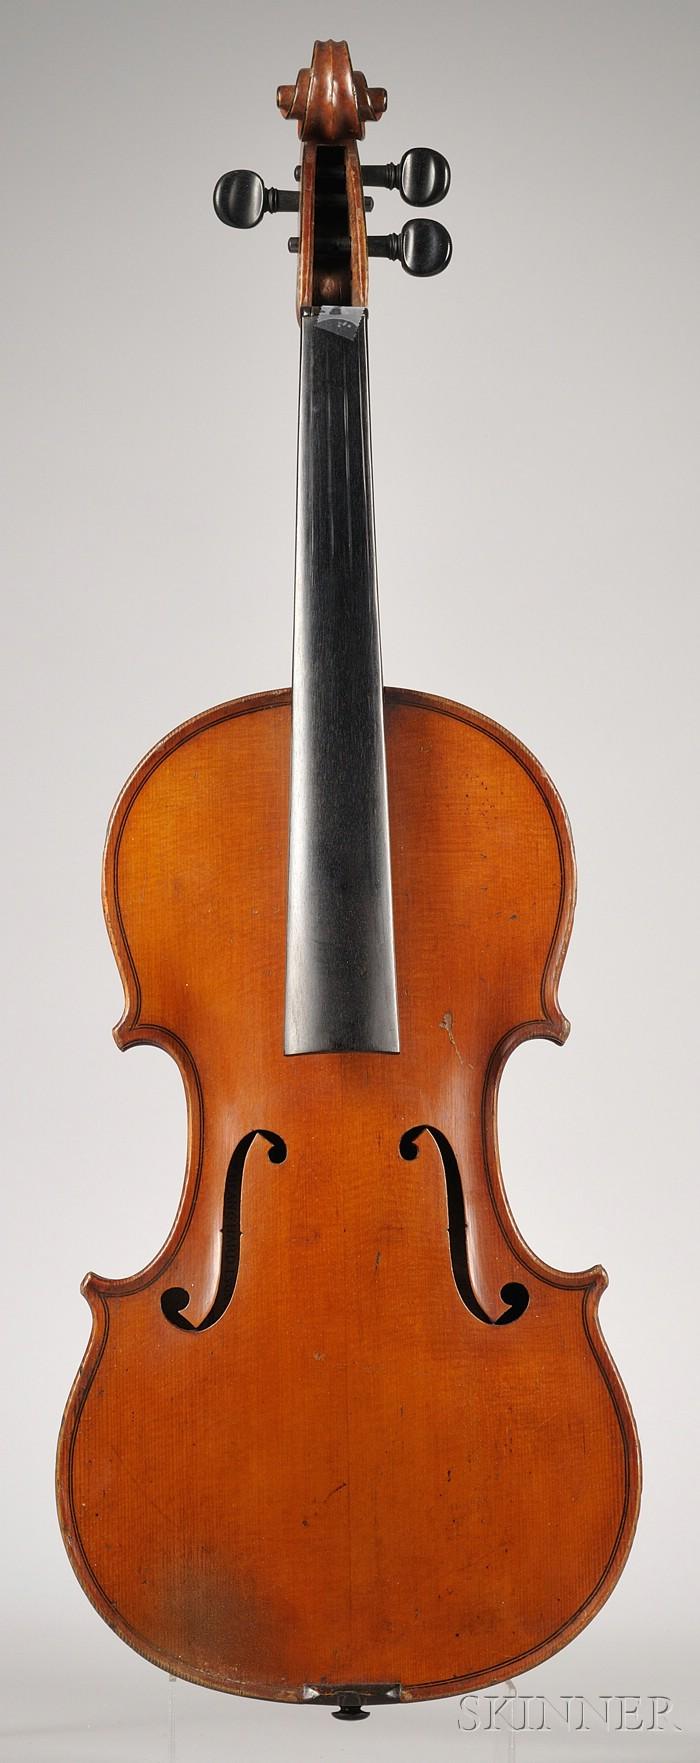 French Violin, Paul Blanchard Workshop, Lyon, 1899